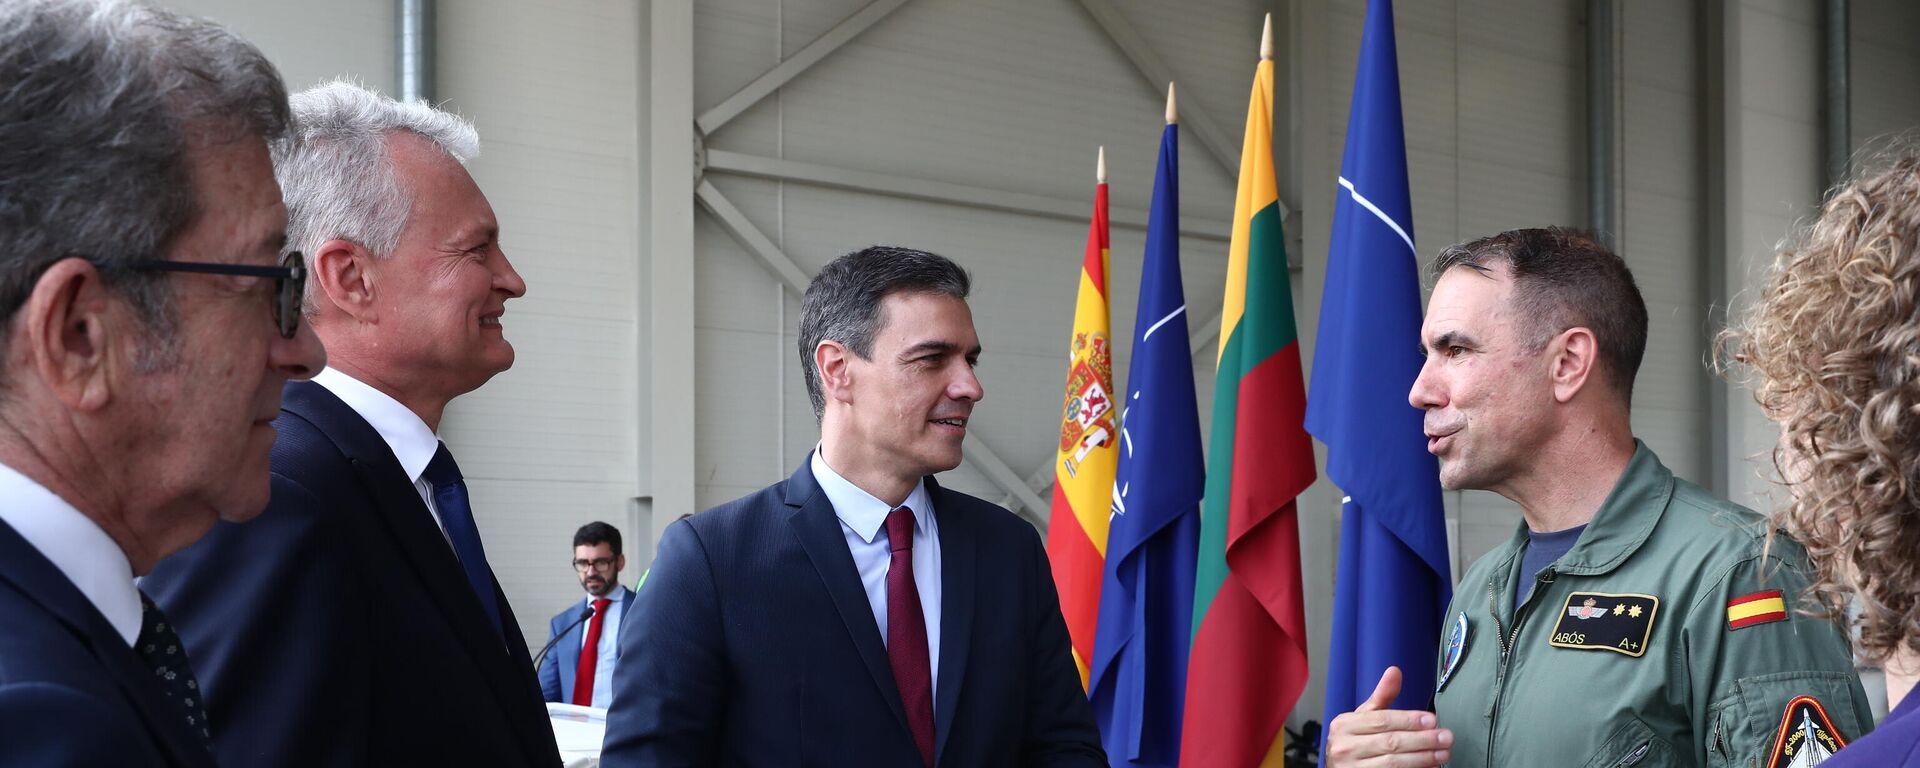 El presidente del Gobierno de España, Pedro Sánchez, durante una rueda de prensa en la base de Siauliai junto al presidente de Lituania, Gitanas Nauseda - Sputnik Mundo, 1920, 08.07.2021